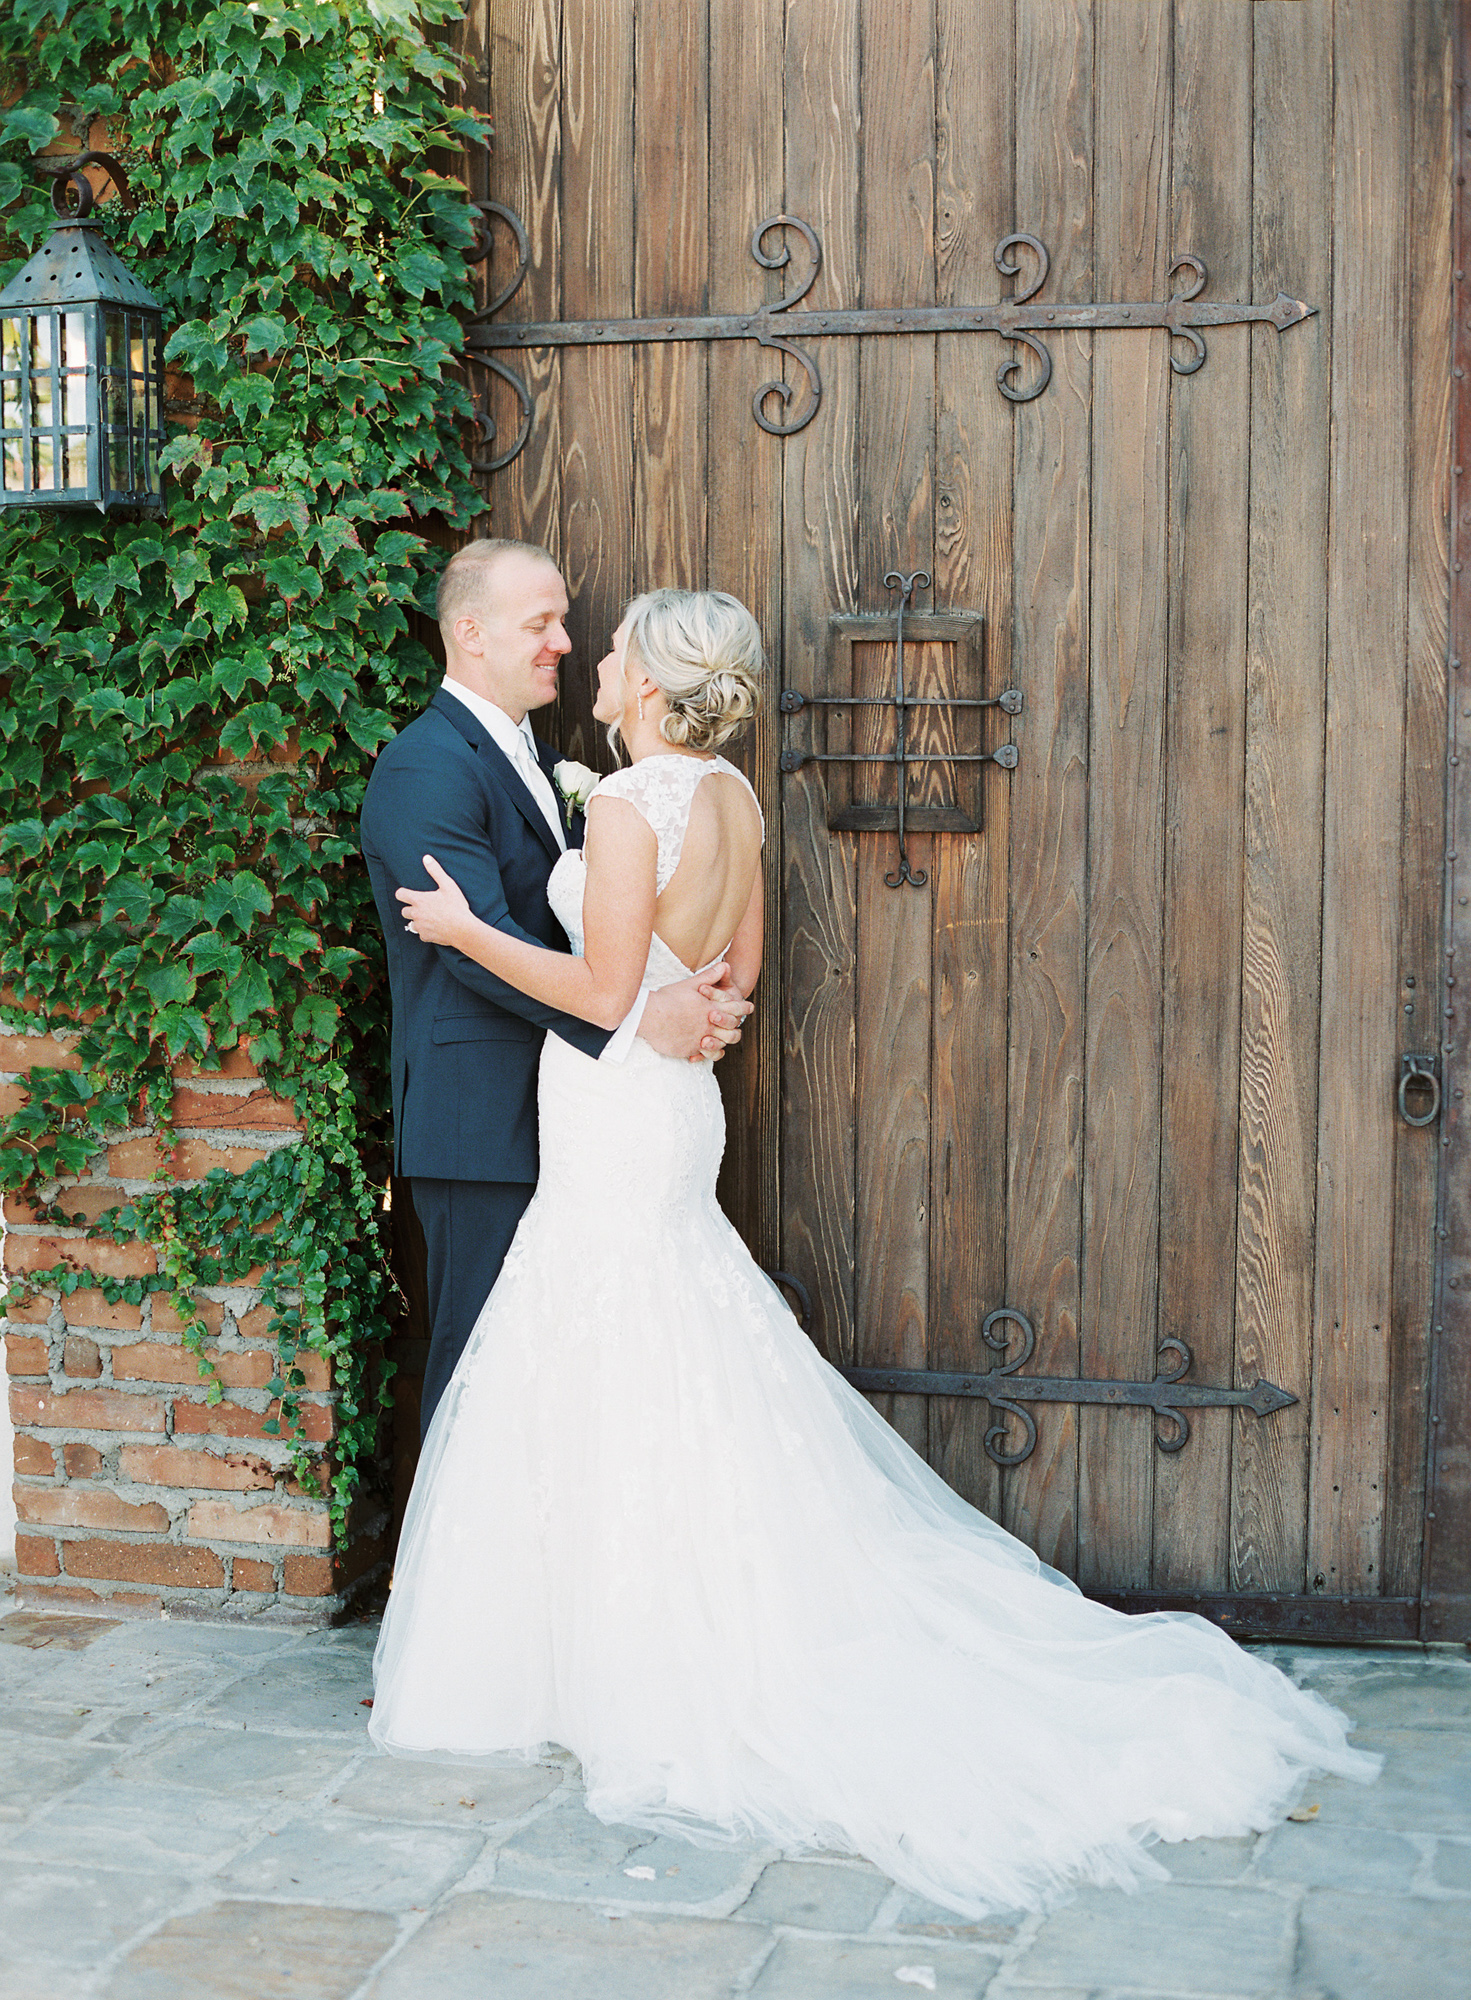 Villa-San-Juan-Capistrano-Wedding-Kristina-Adams-44.jpg